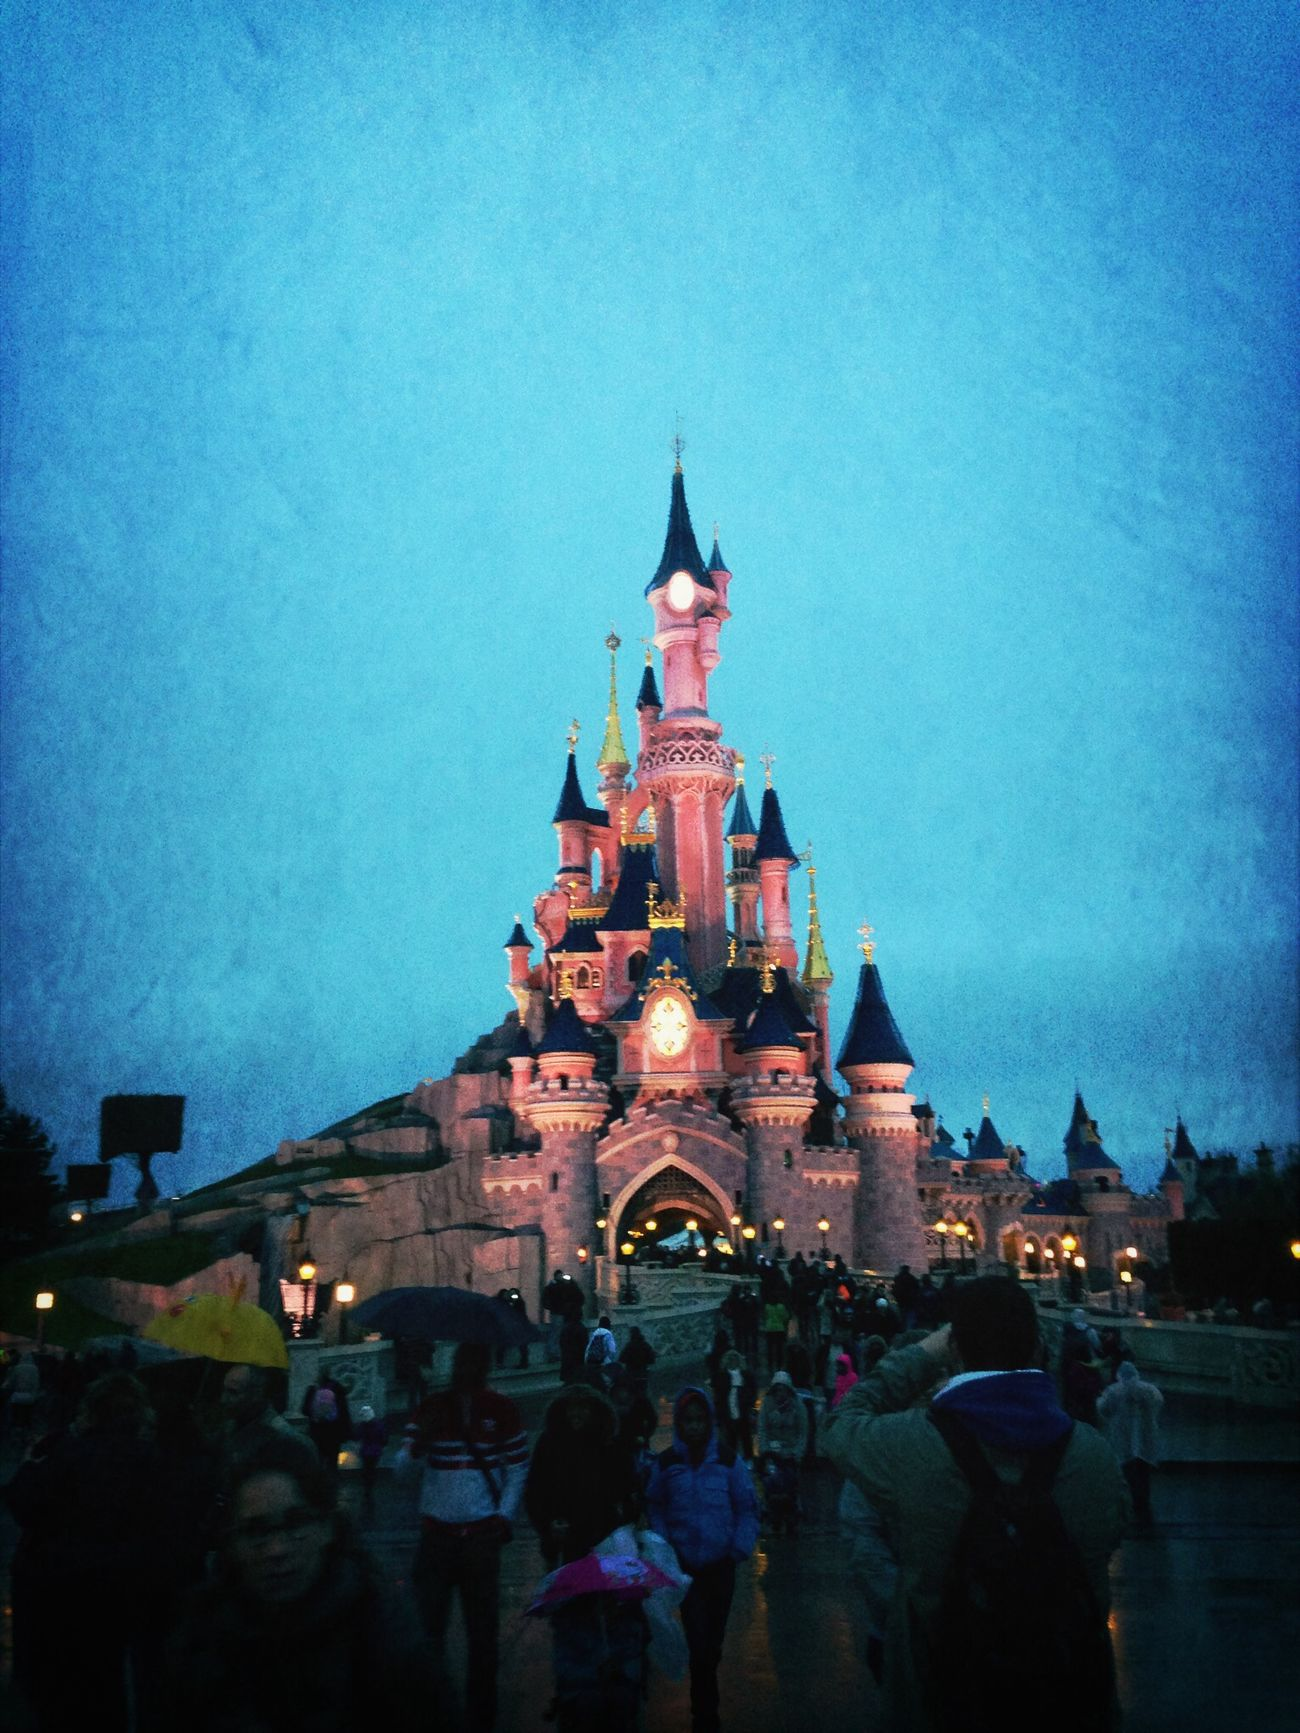 Princess castle ahead